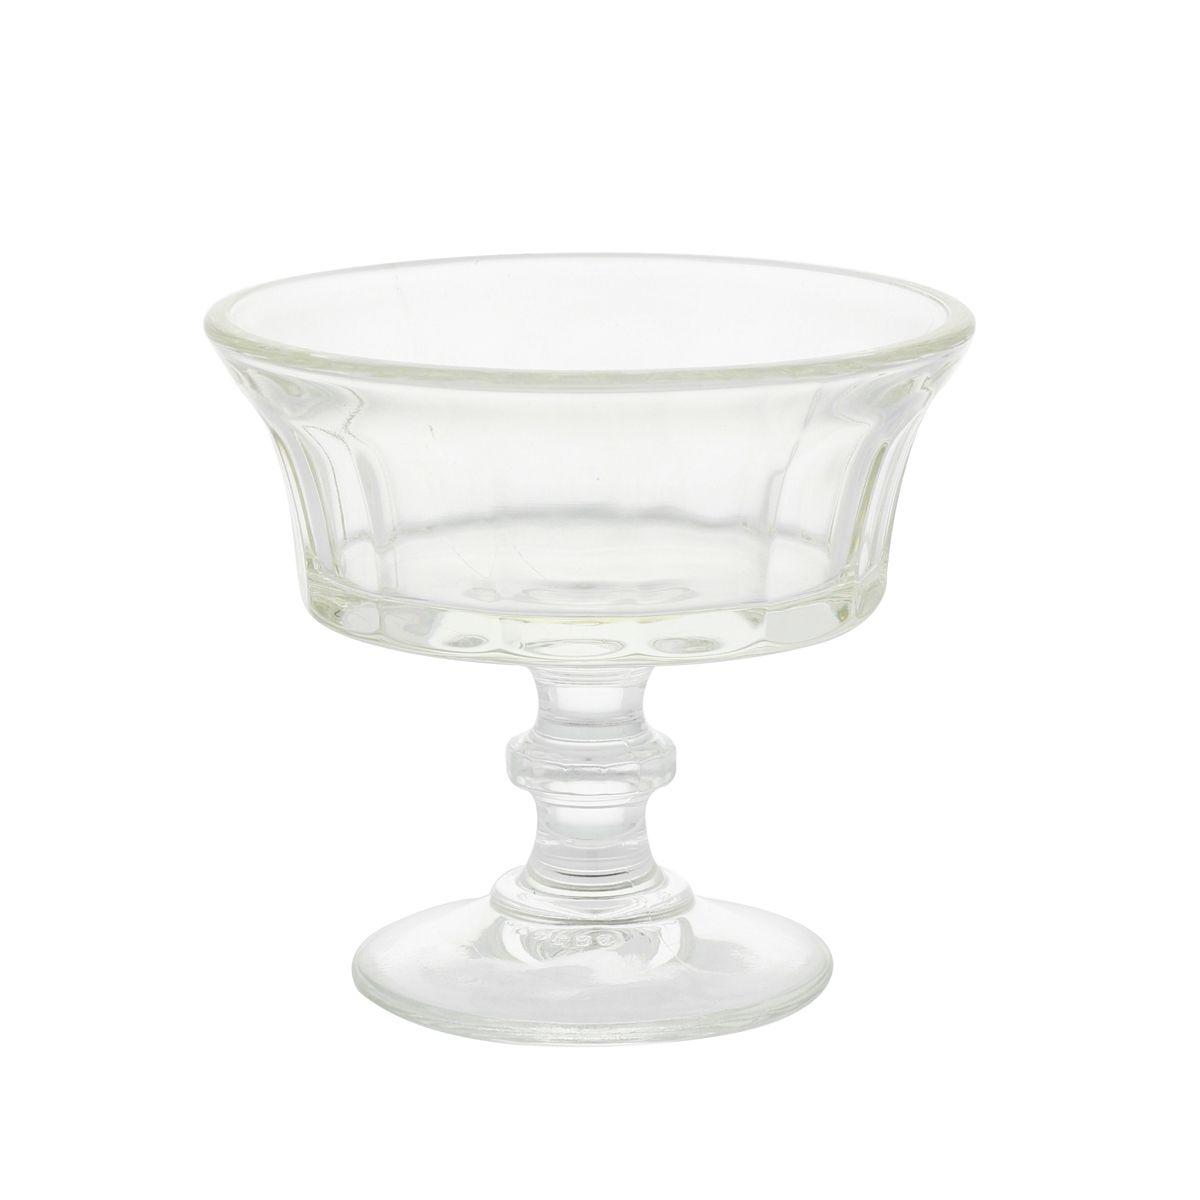 coupe a glace en verre modele champagne la rochere. Black Bedroom Furniture Sets. Home Design Ideas